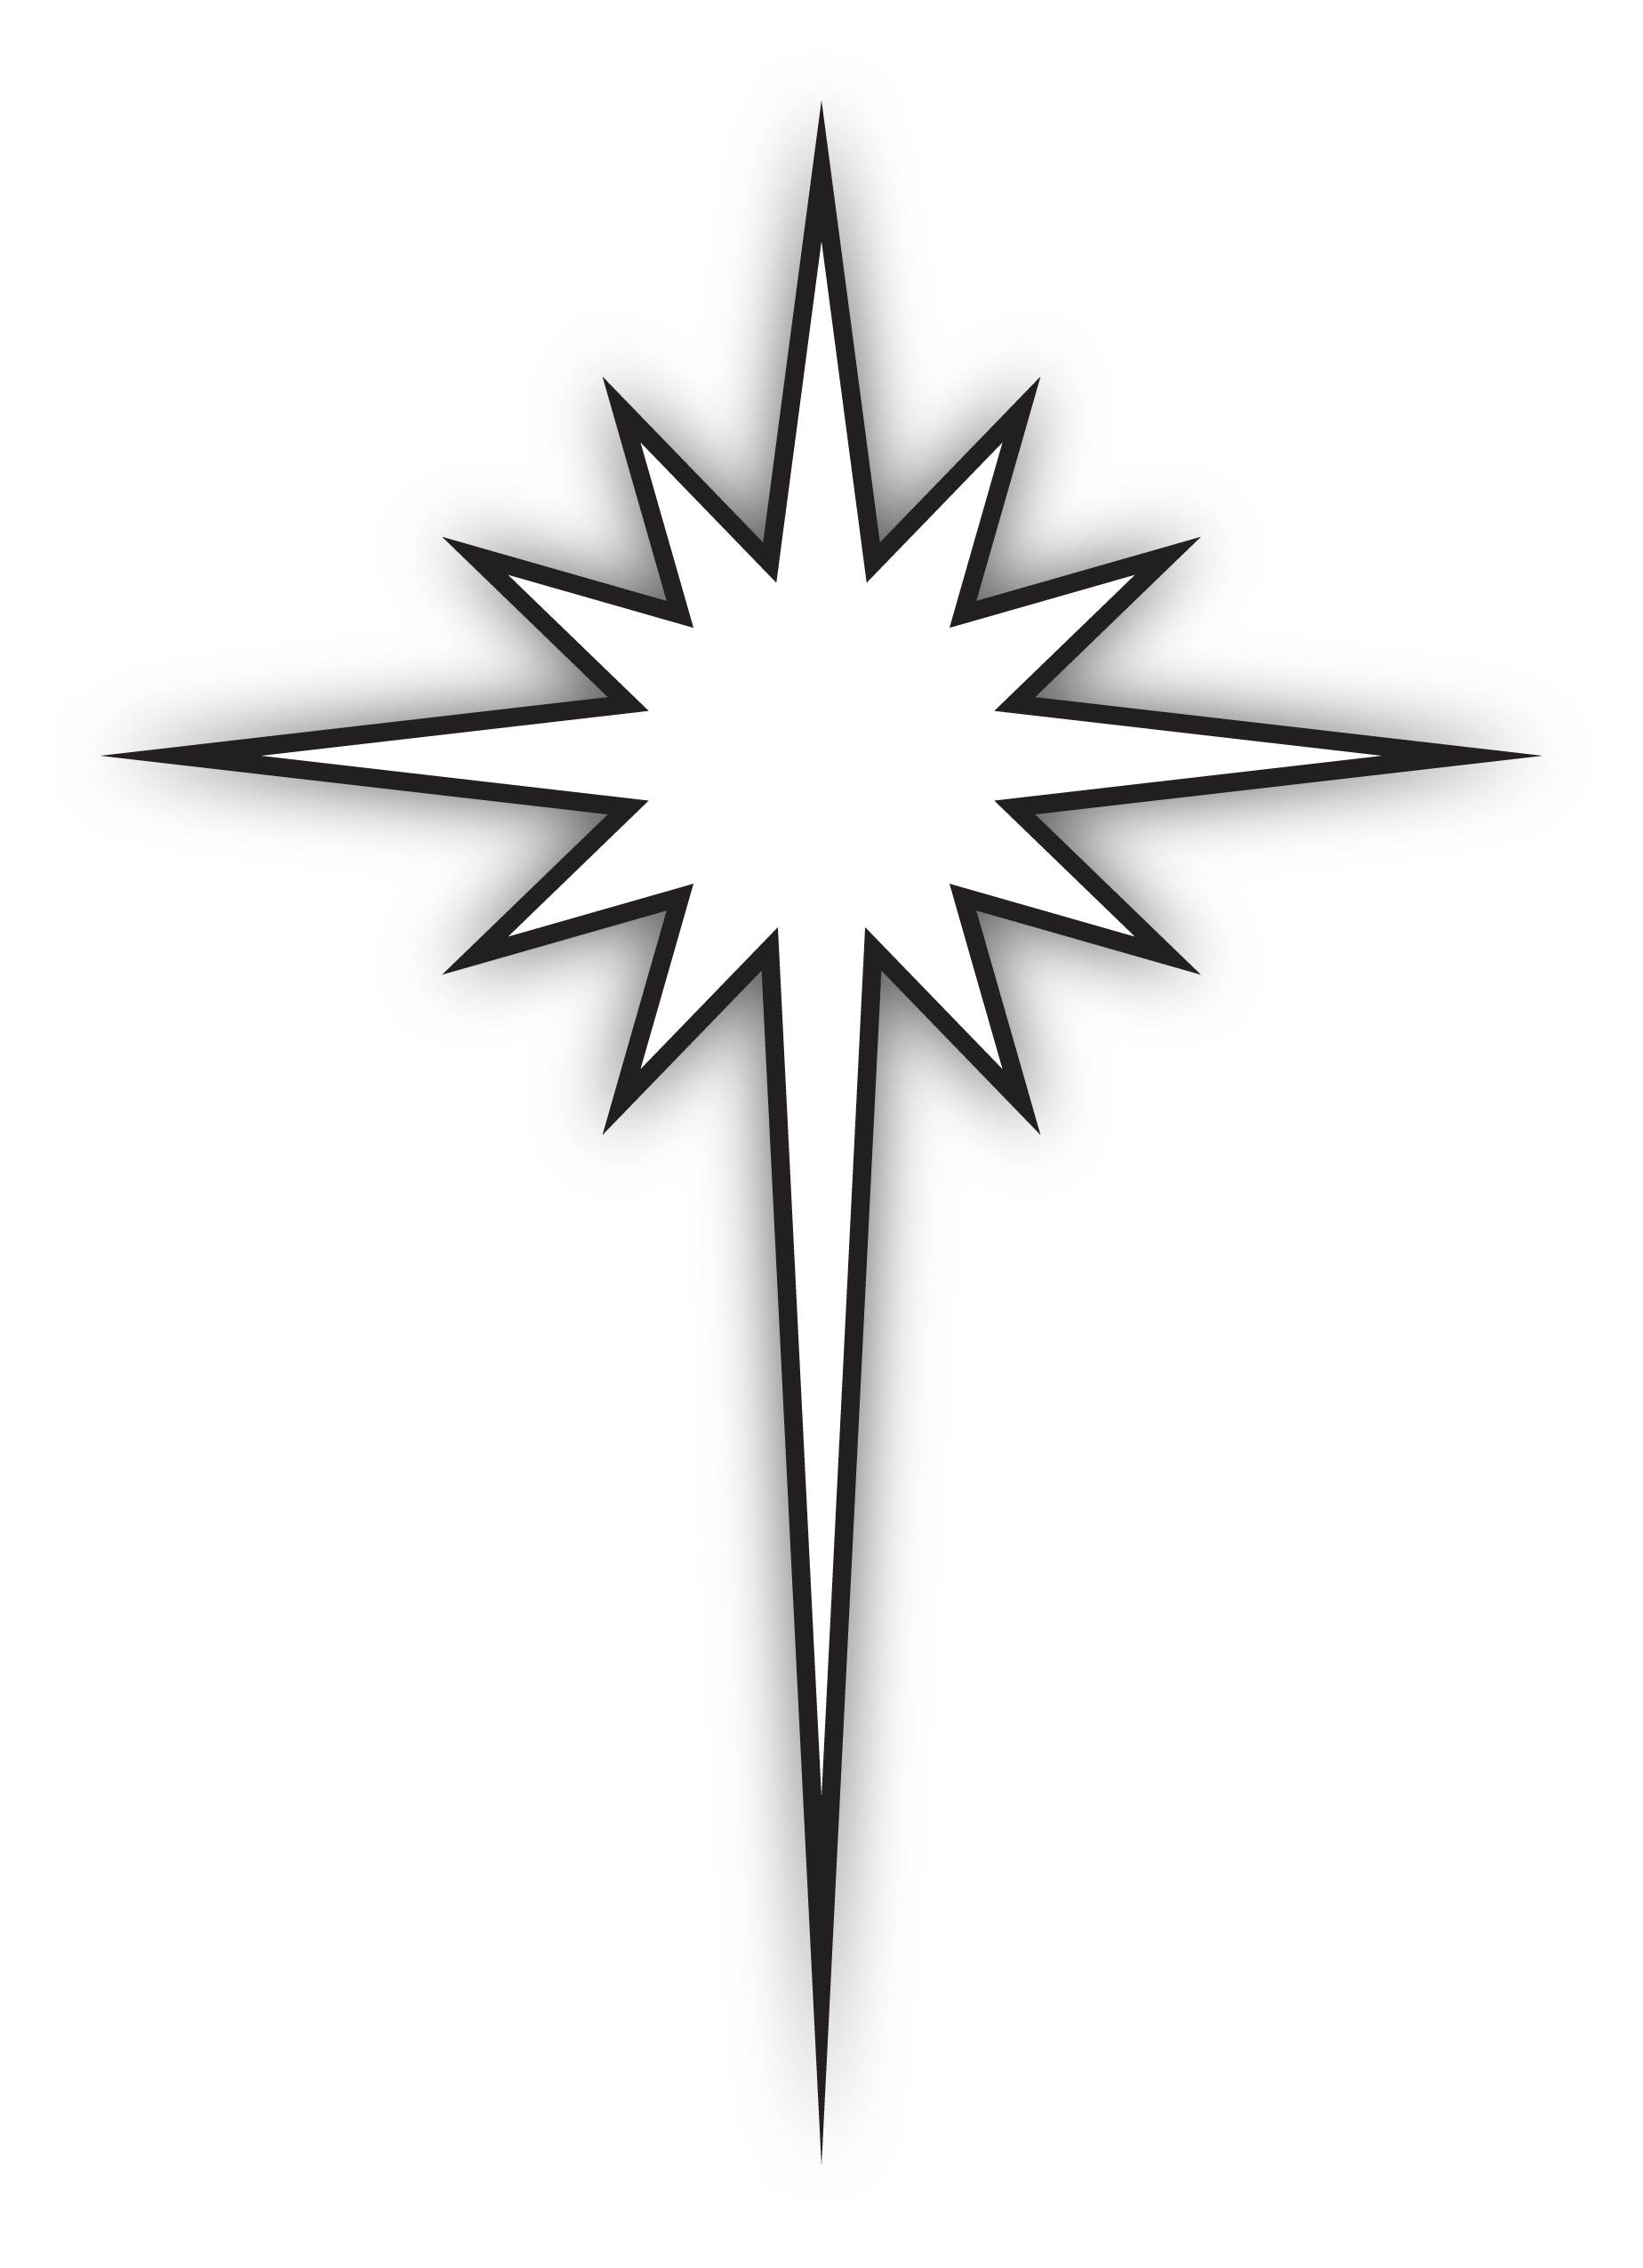 1848x2551 Star Of Bethlehem Clipart Many Interesting Cliparts